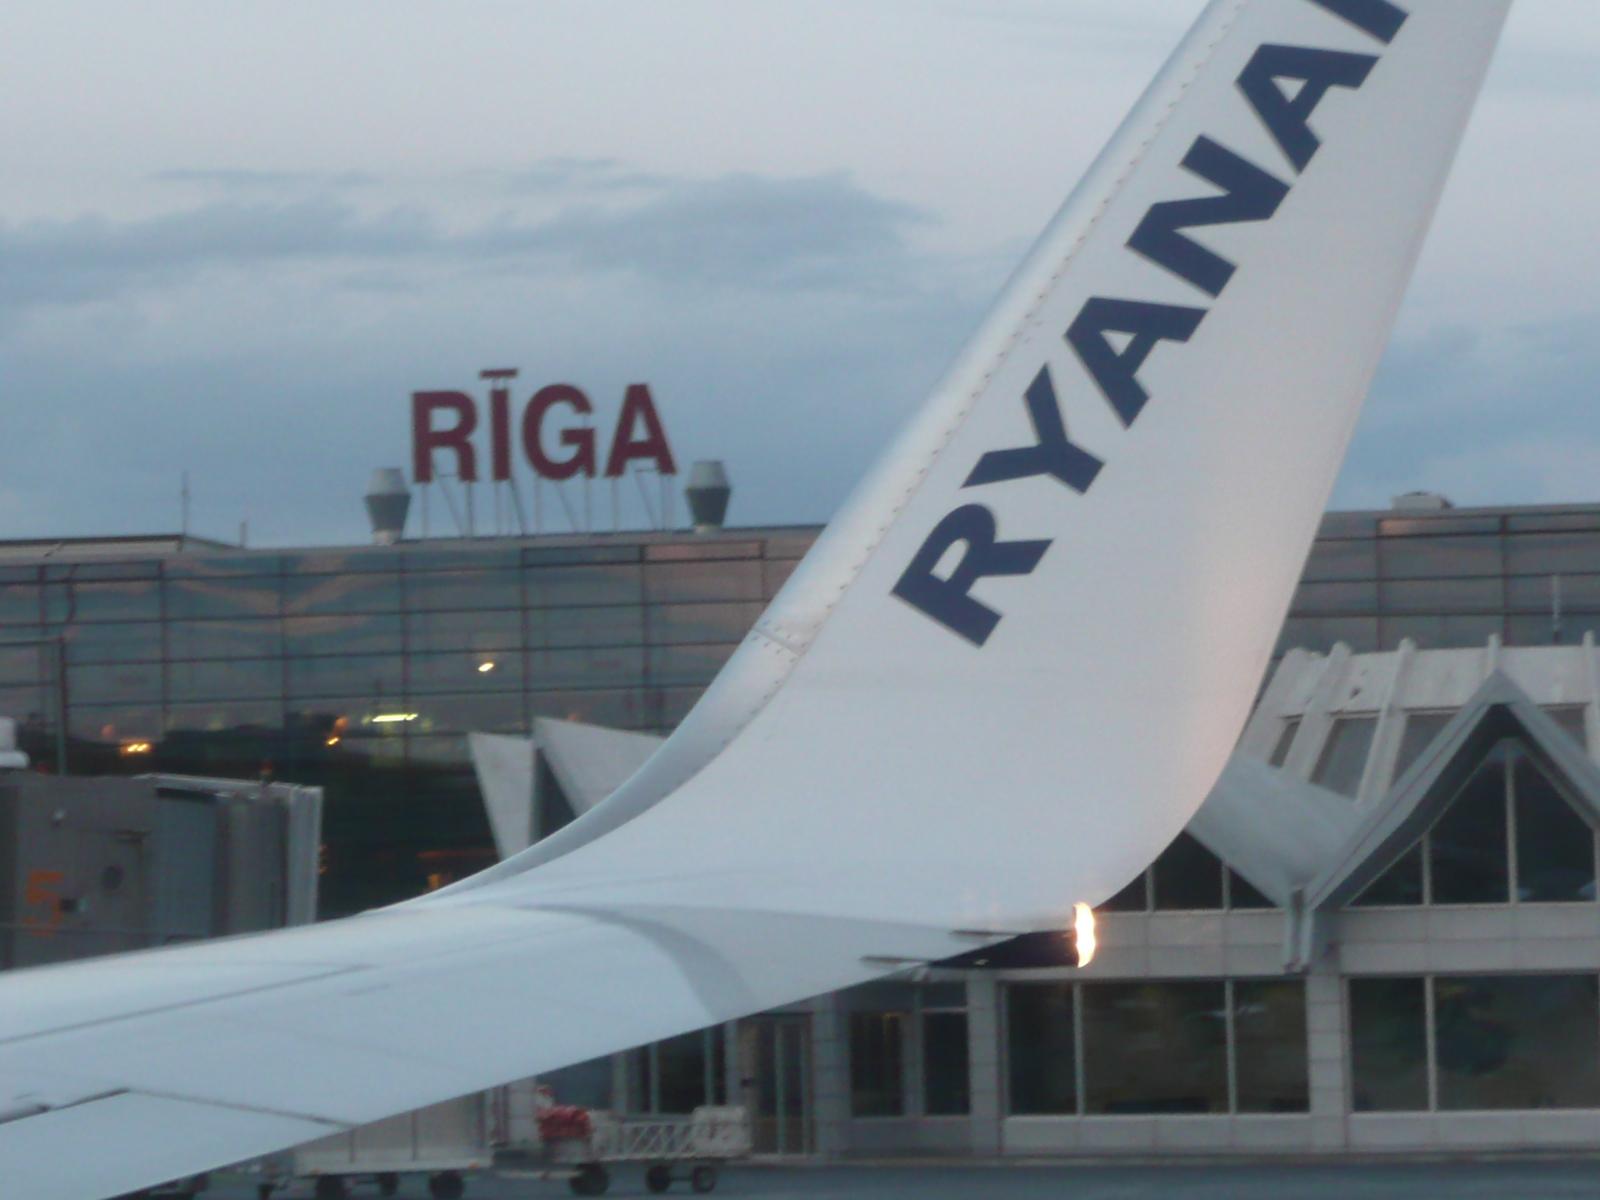 Riga VOK veteranen april 2010